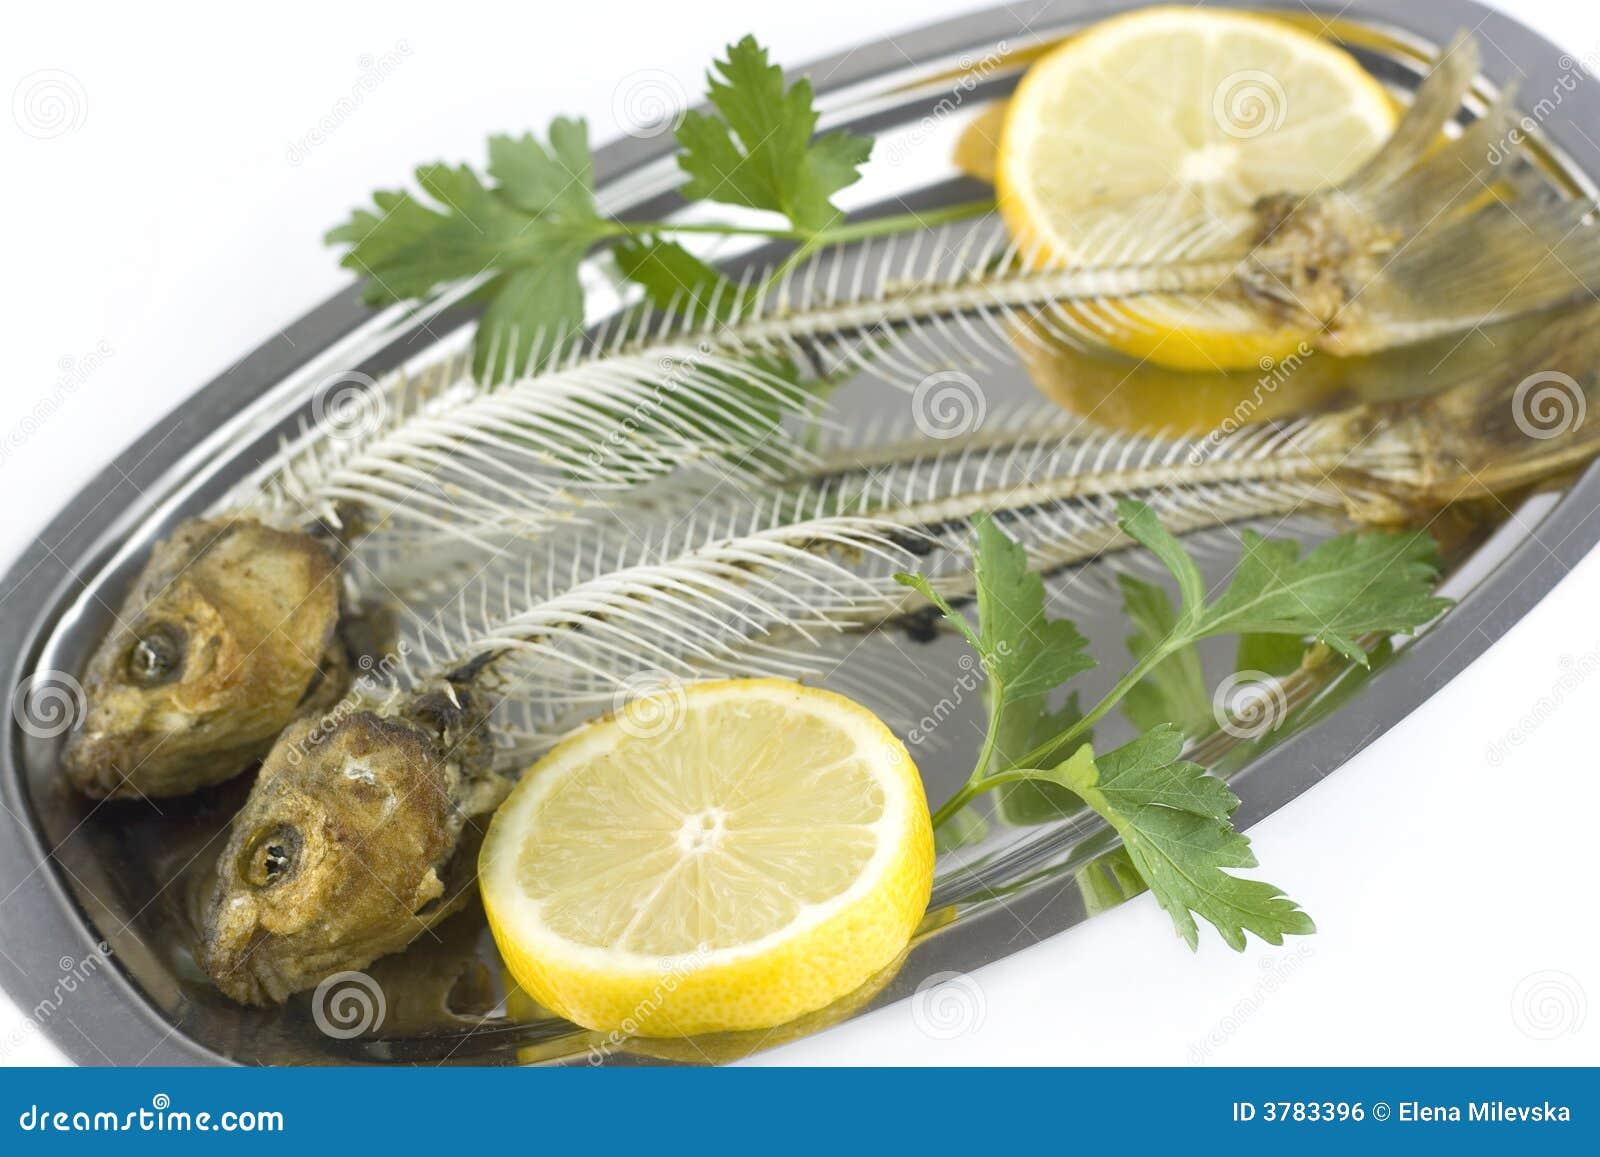 Fish bones royalty free stock image image 3783396 for Fish bone meal